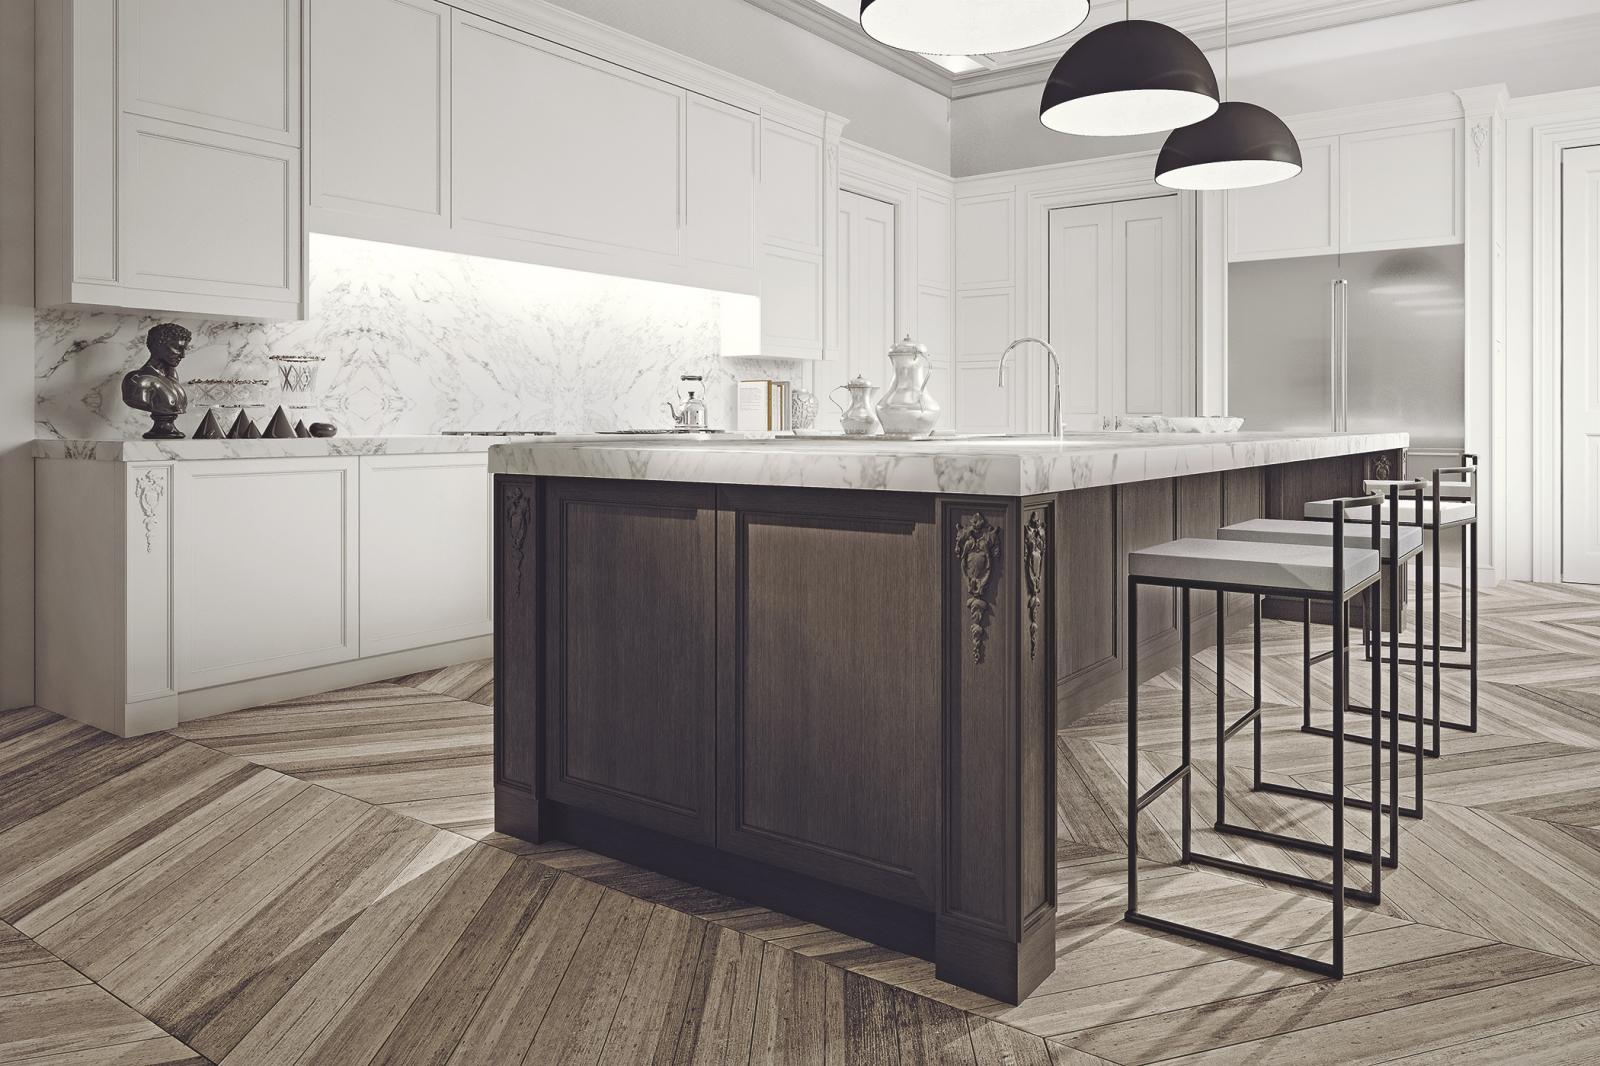 villa_borghese_kitchen_4.jpg